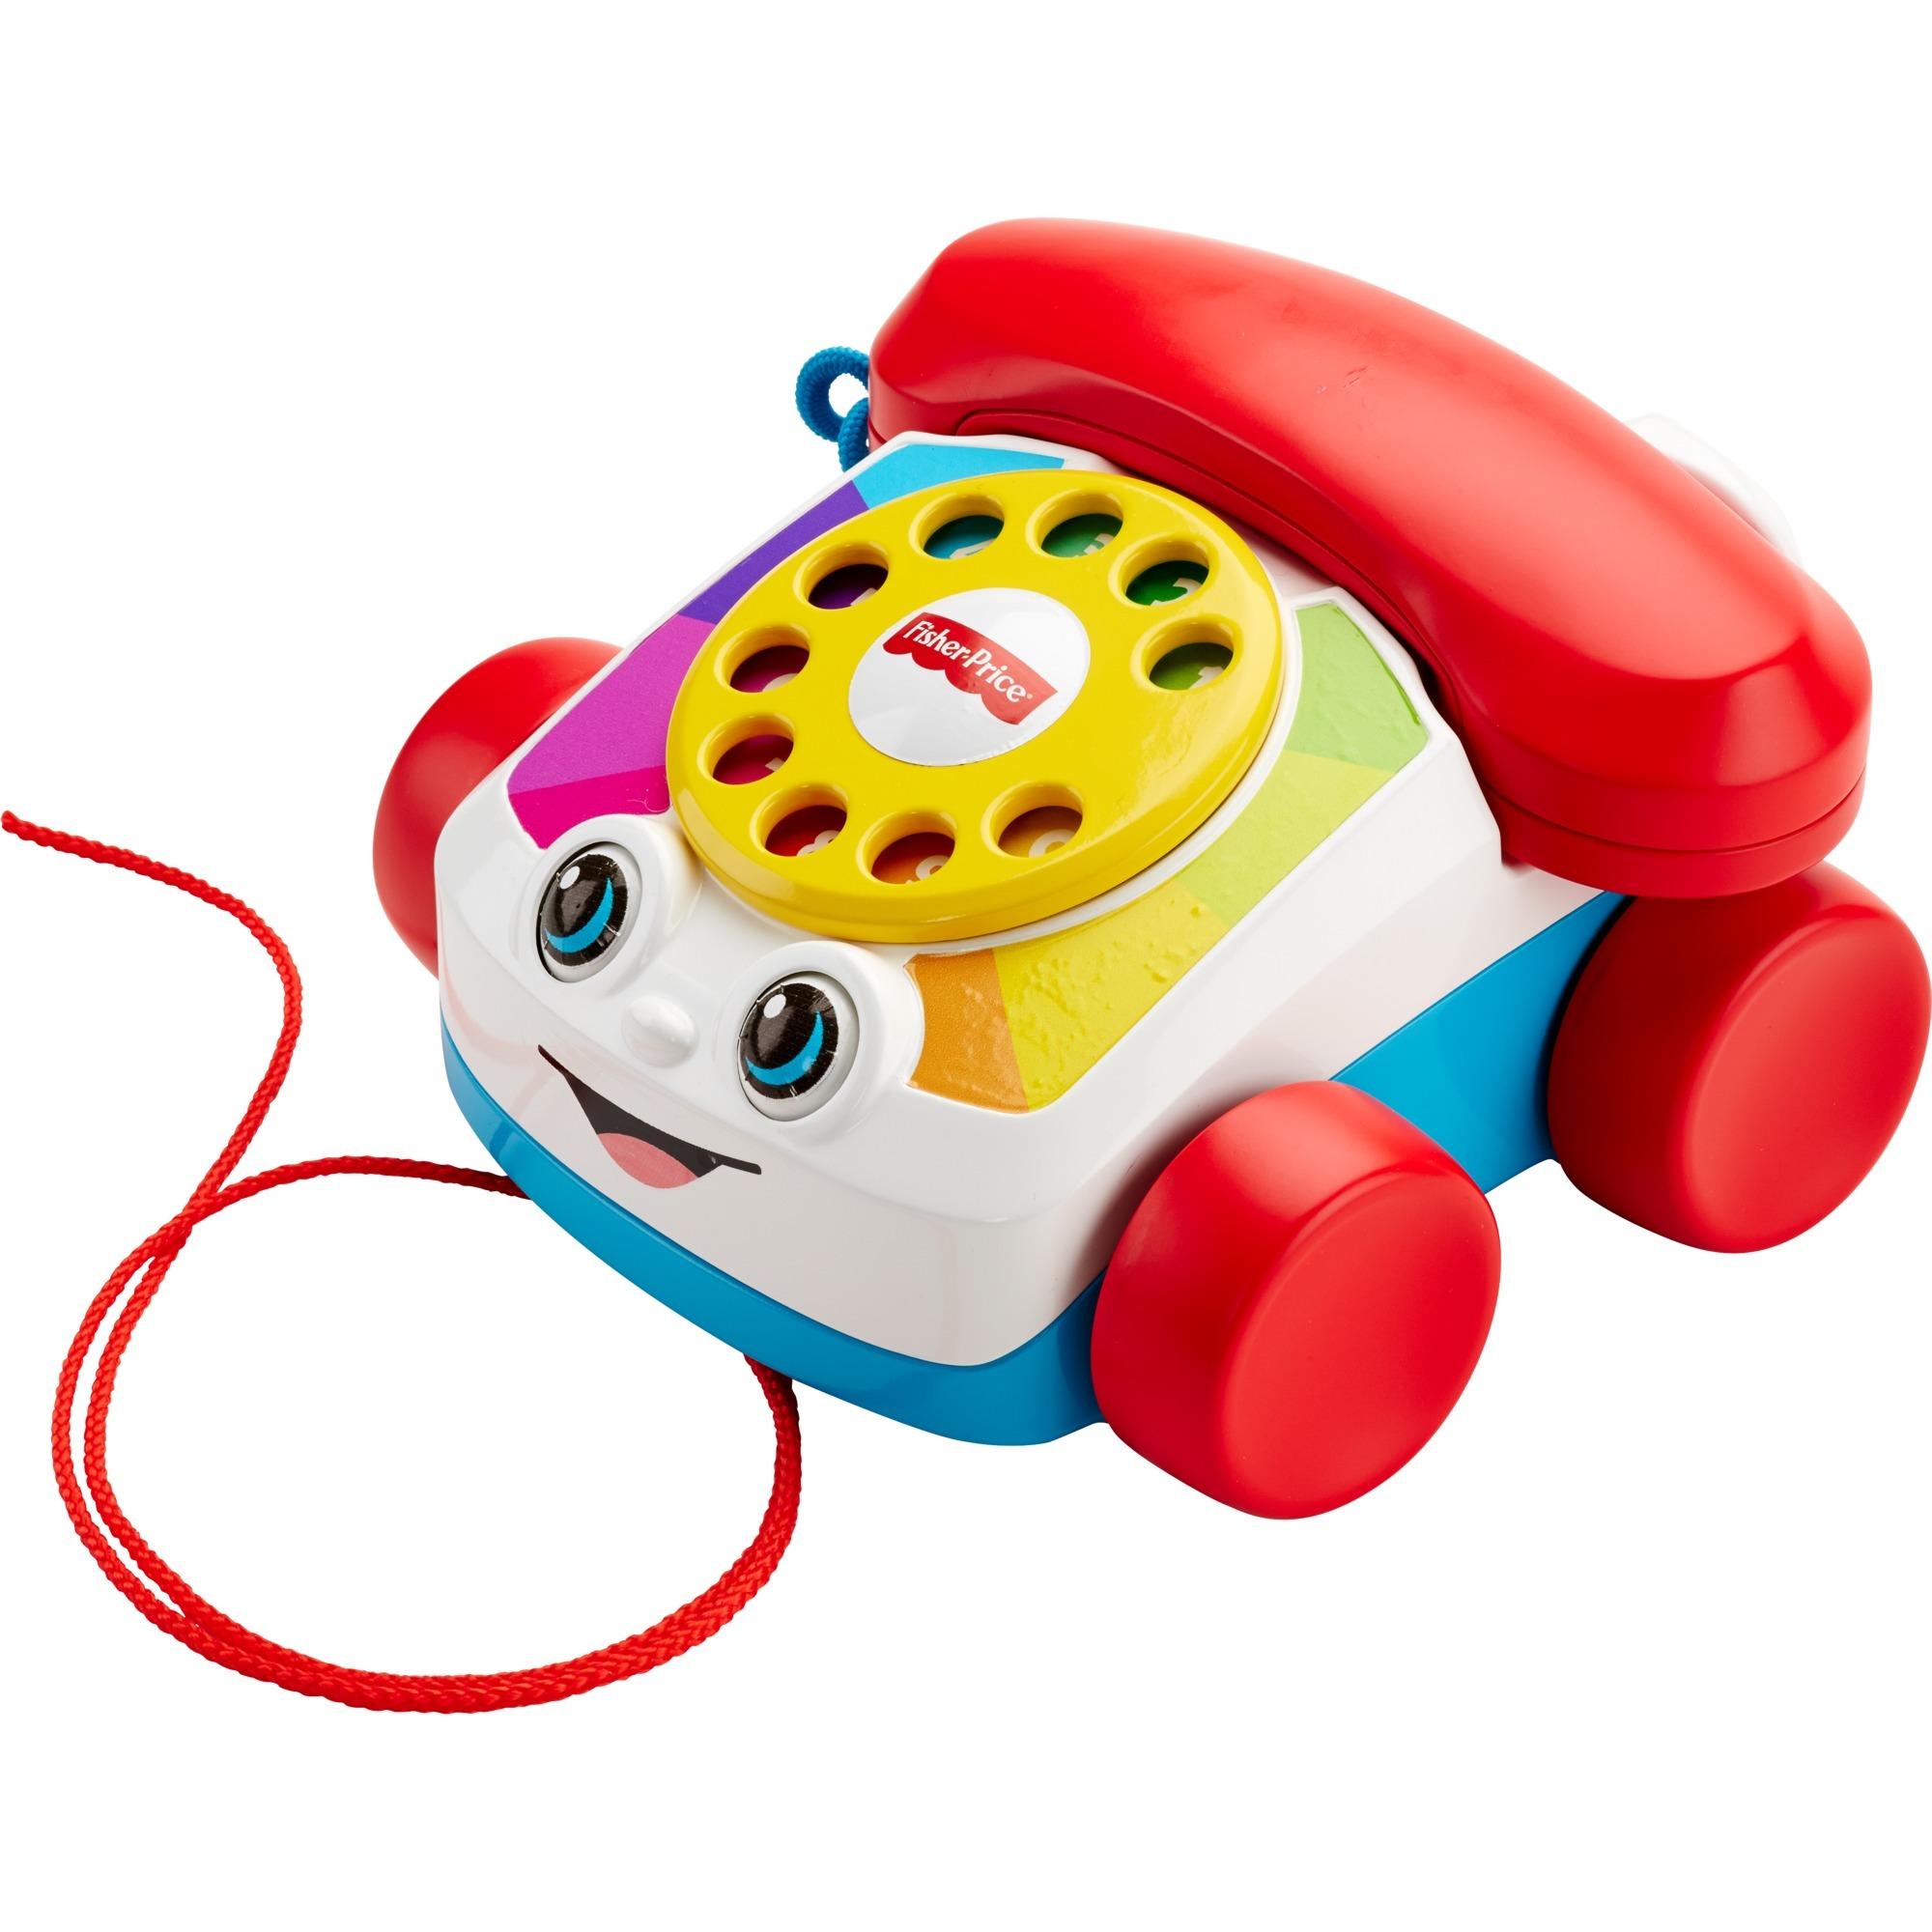 cmy08-telefon